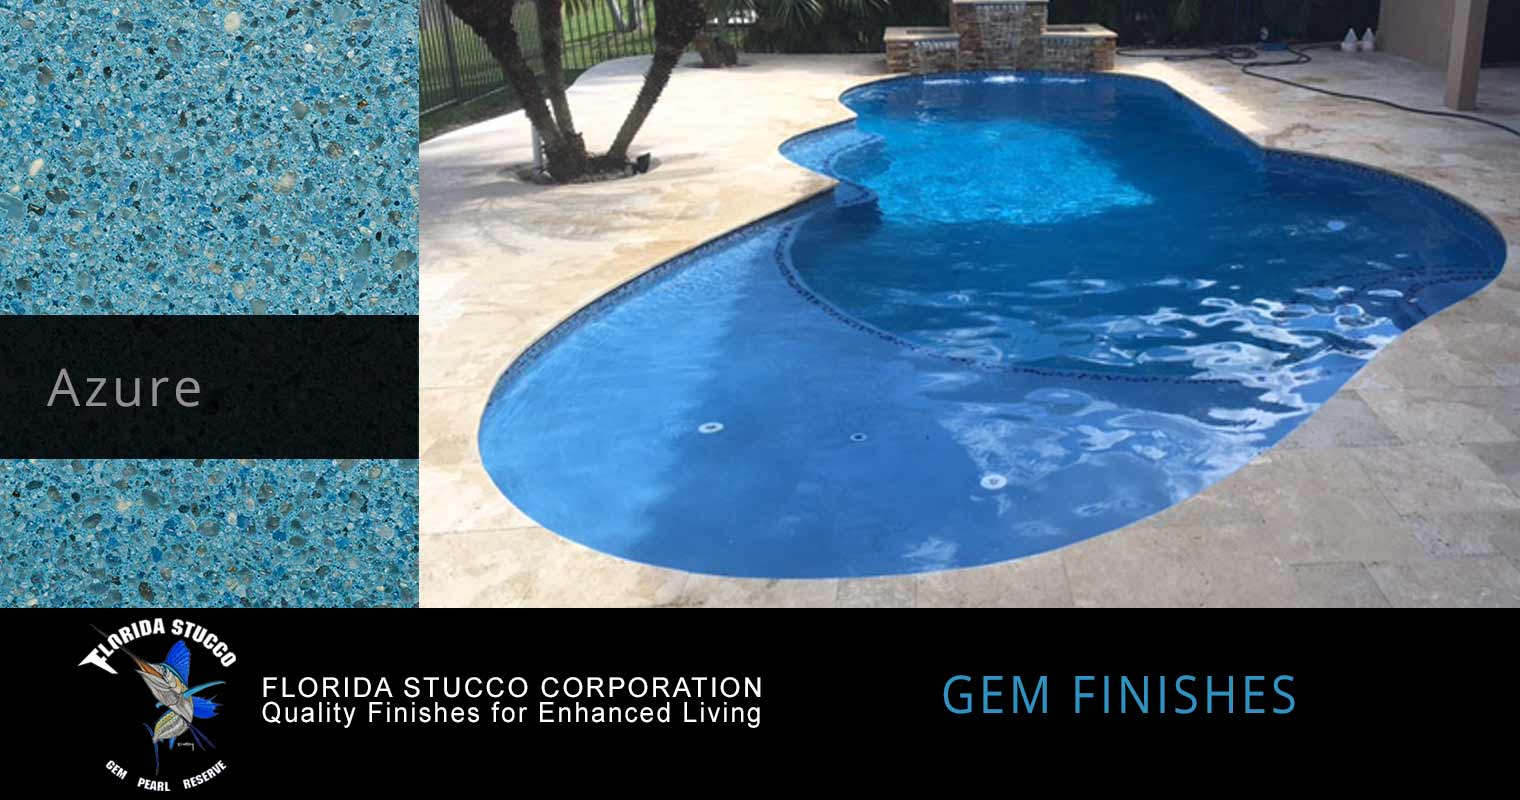 Florida Stucco - Azure Plaster Finish Pool Sample 2